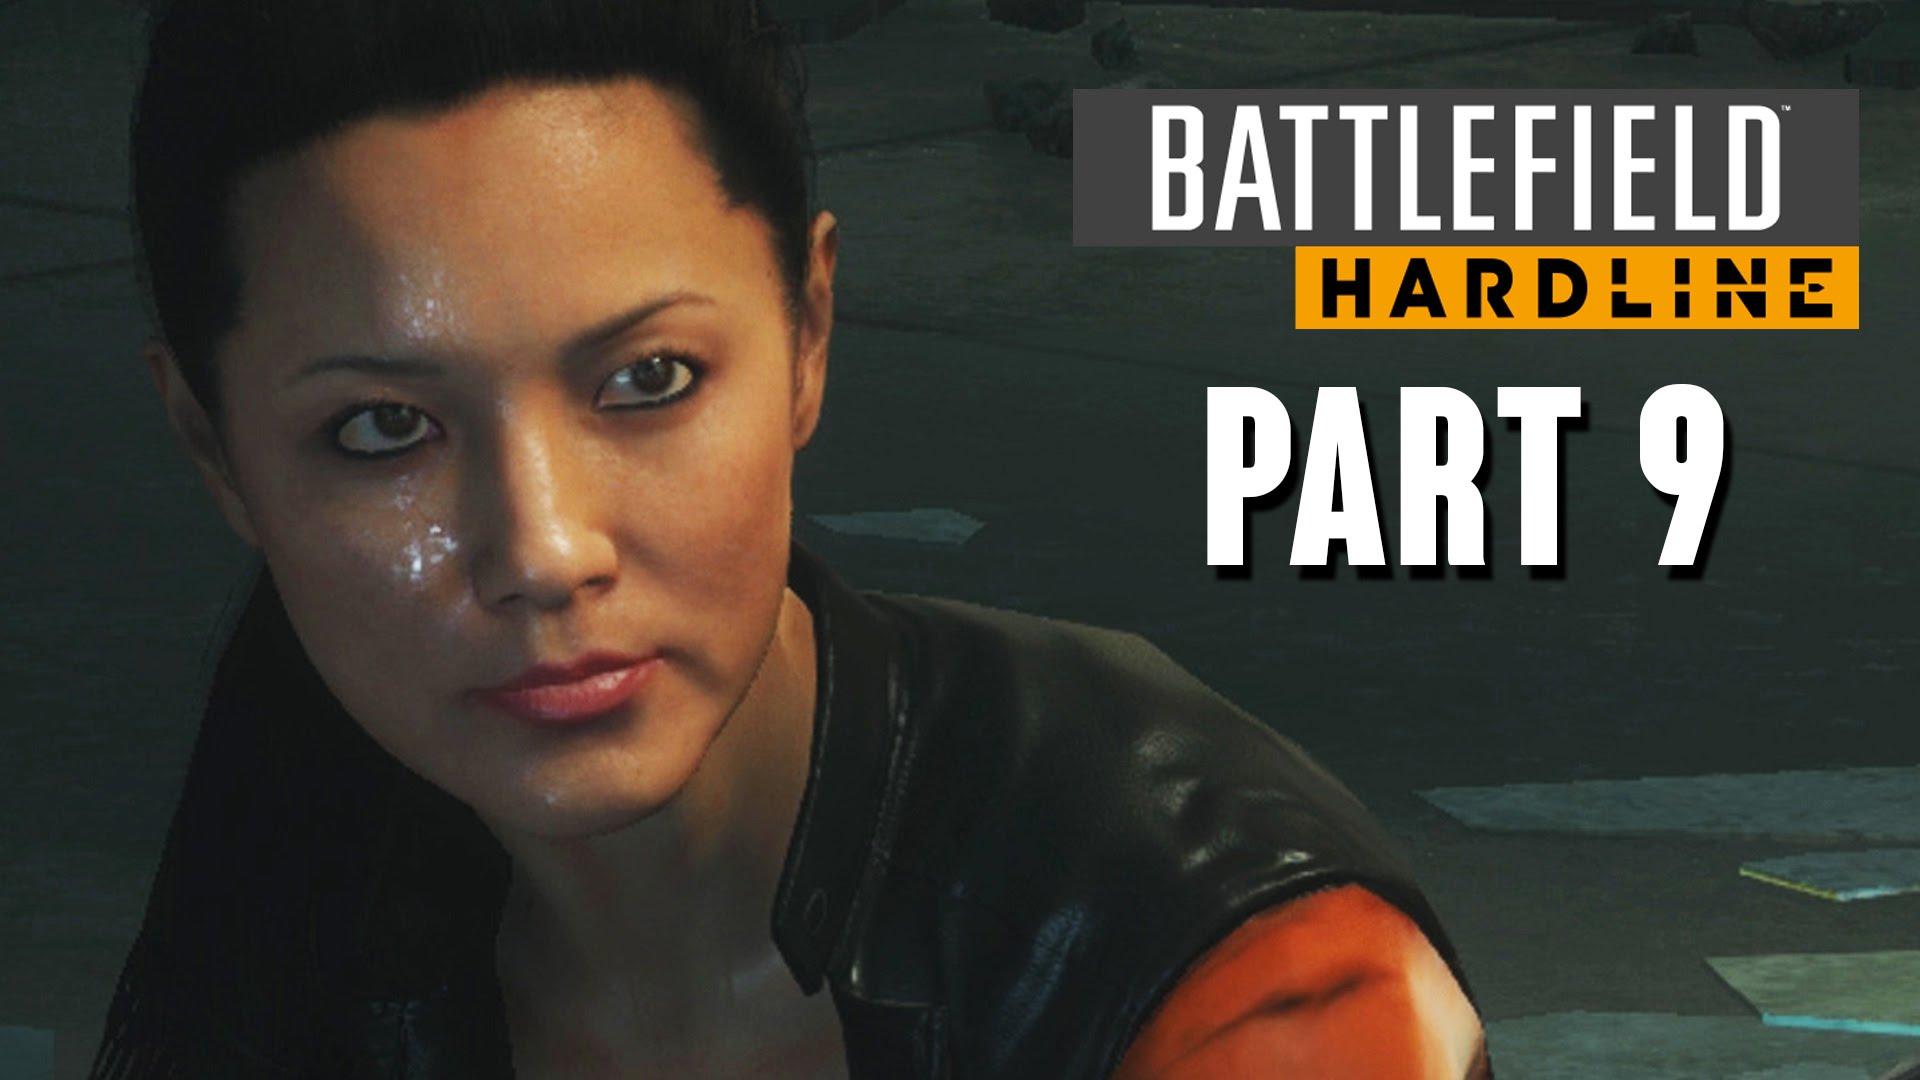 بتلفیلد هاردلاین مرحله9 - Battlefield Hardline-PC Part9